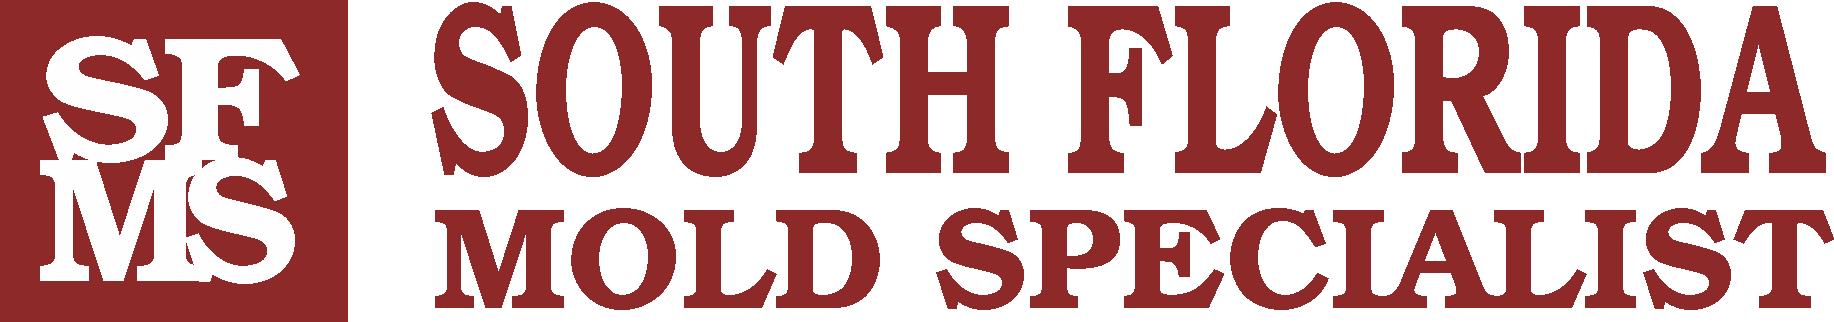 South Florida Mold Specialist Logo